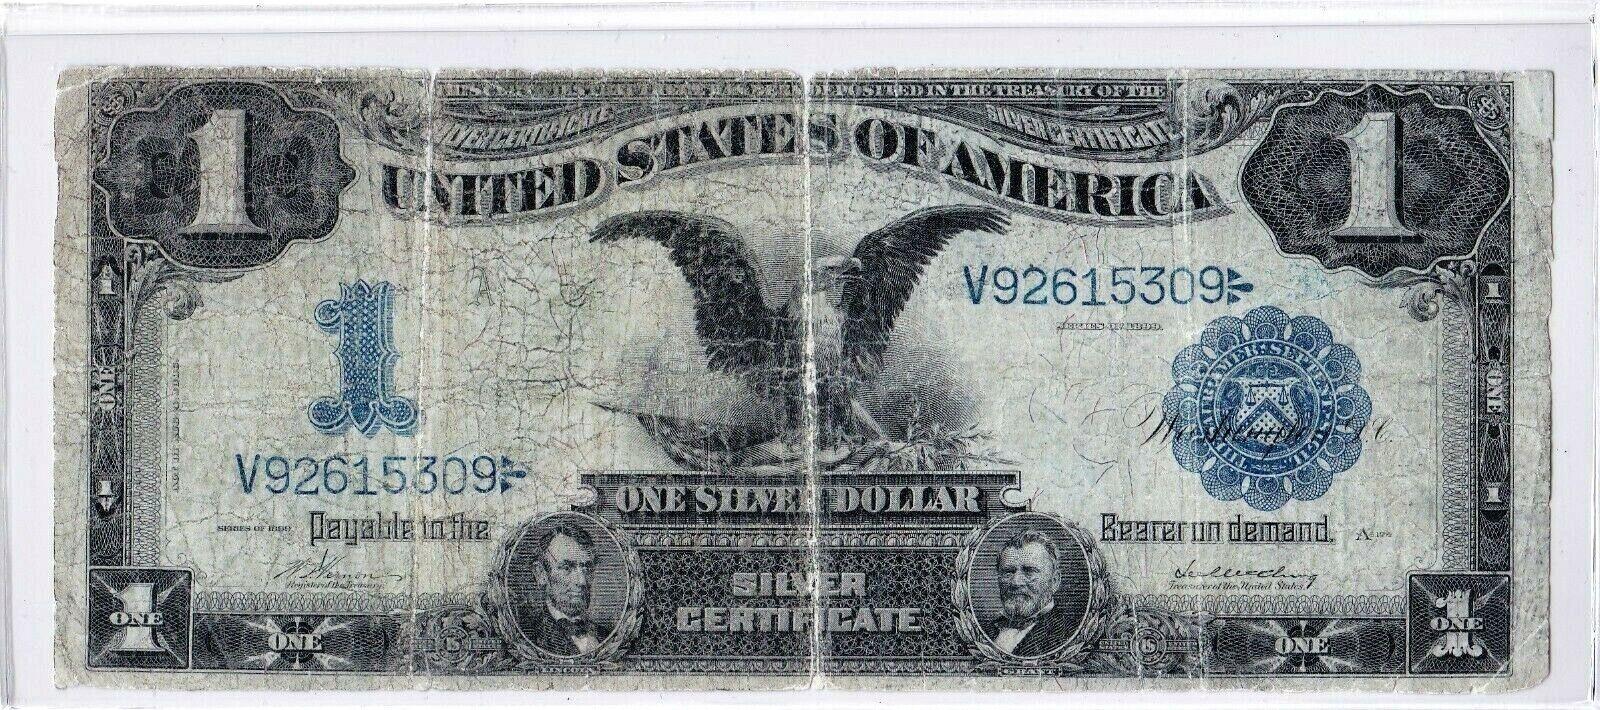 1899 $1 BLACK EAGLE Silver Certificate Large Blue Seal FR-239 Vernon / McClung